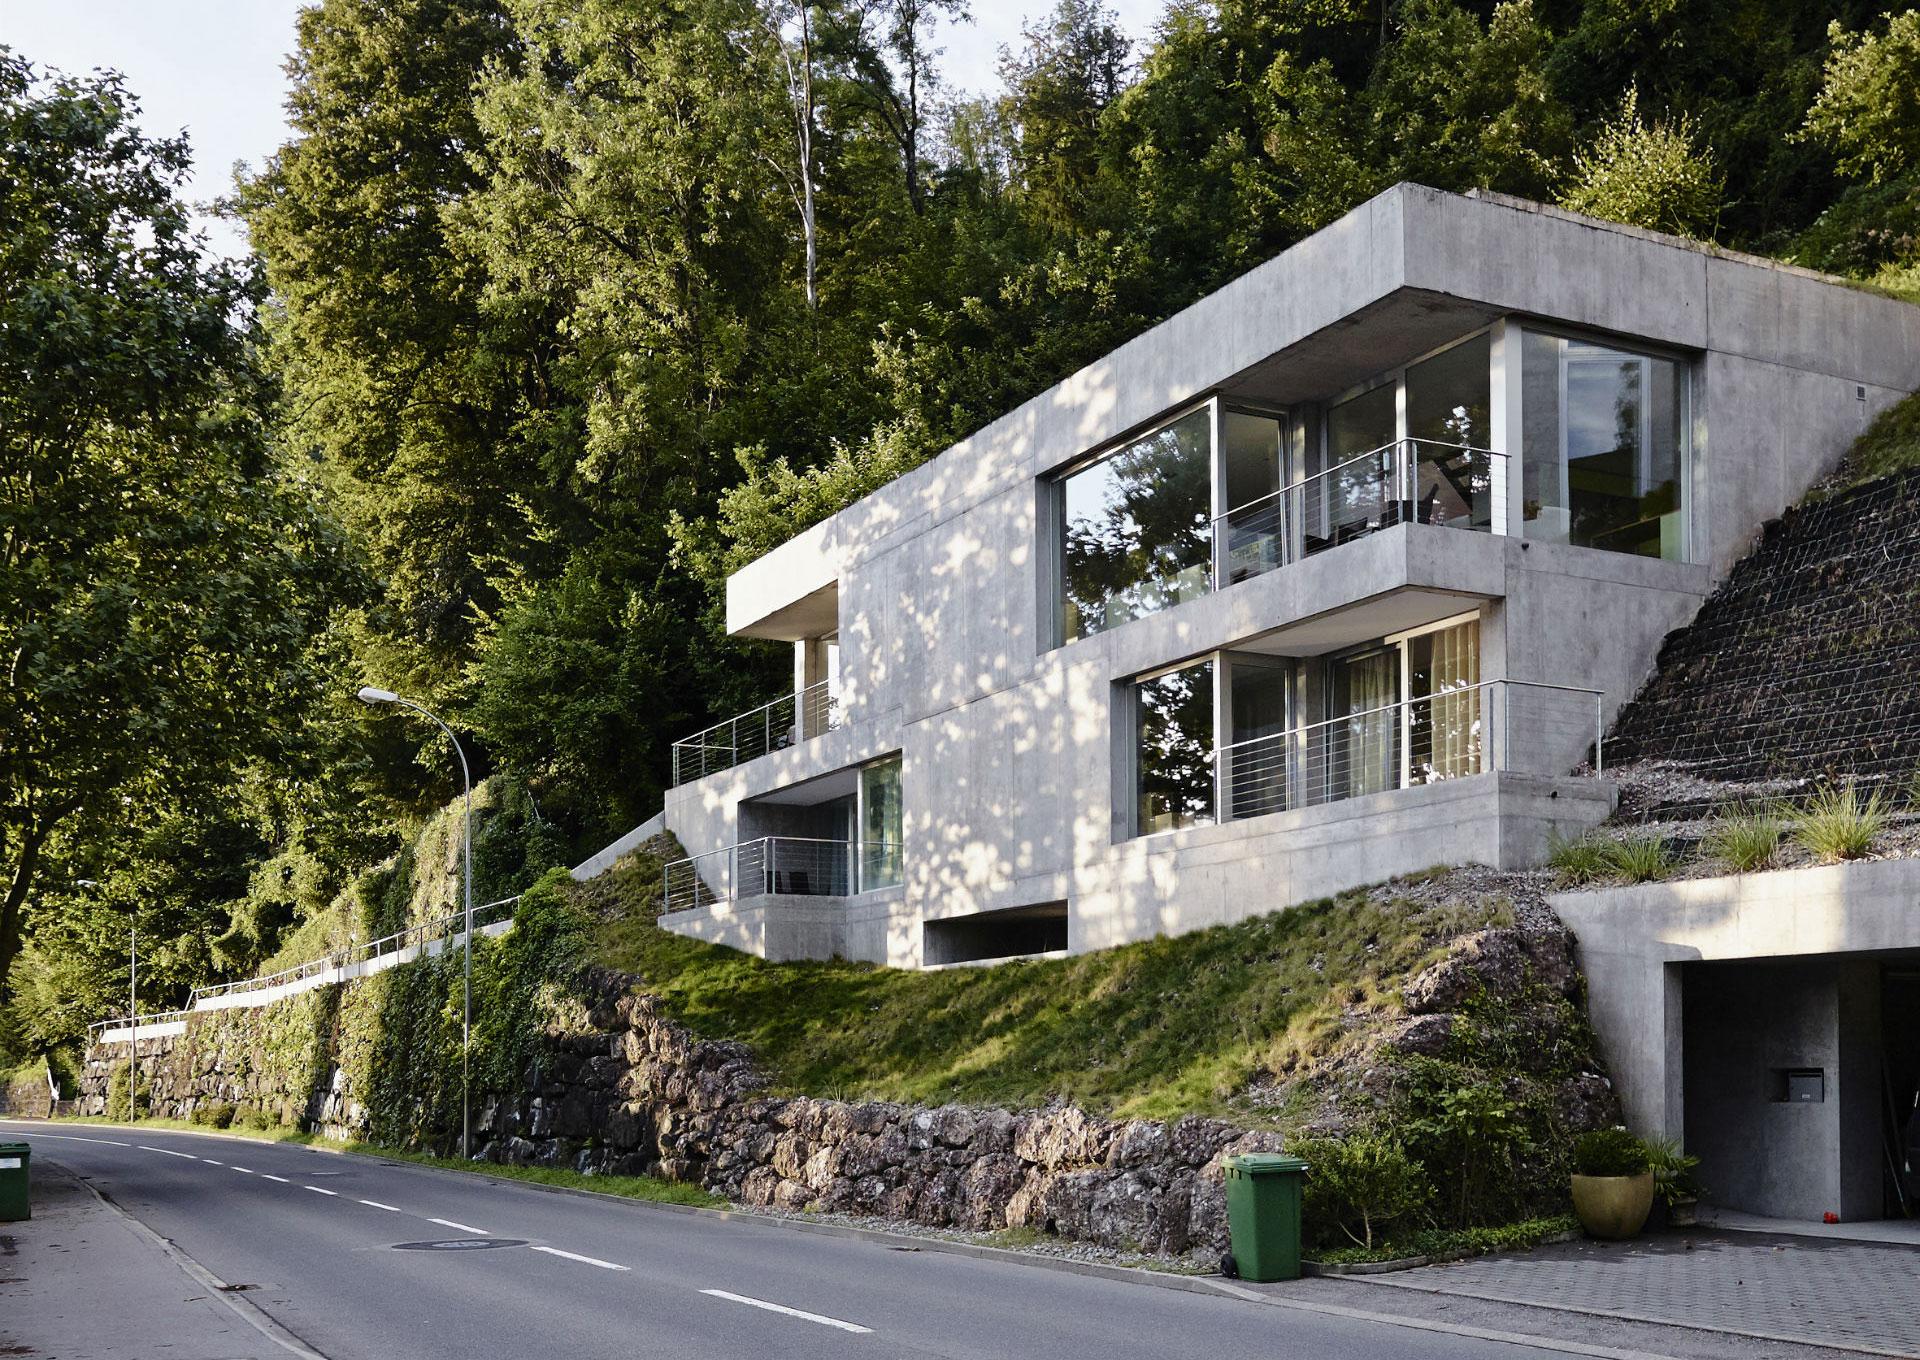 mondrianHouse-lakesidedevelopment-lsd-swiss-15-2